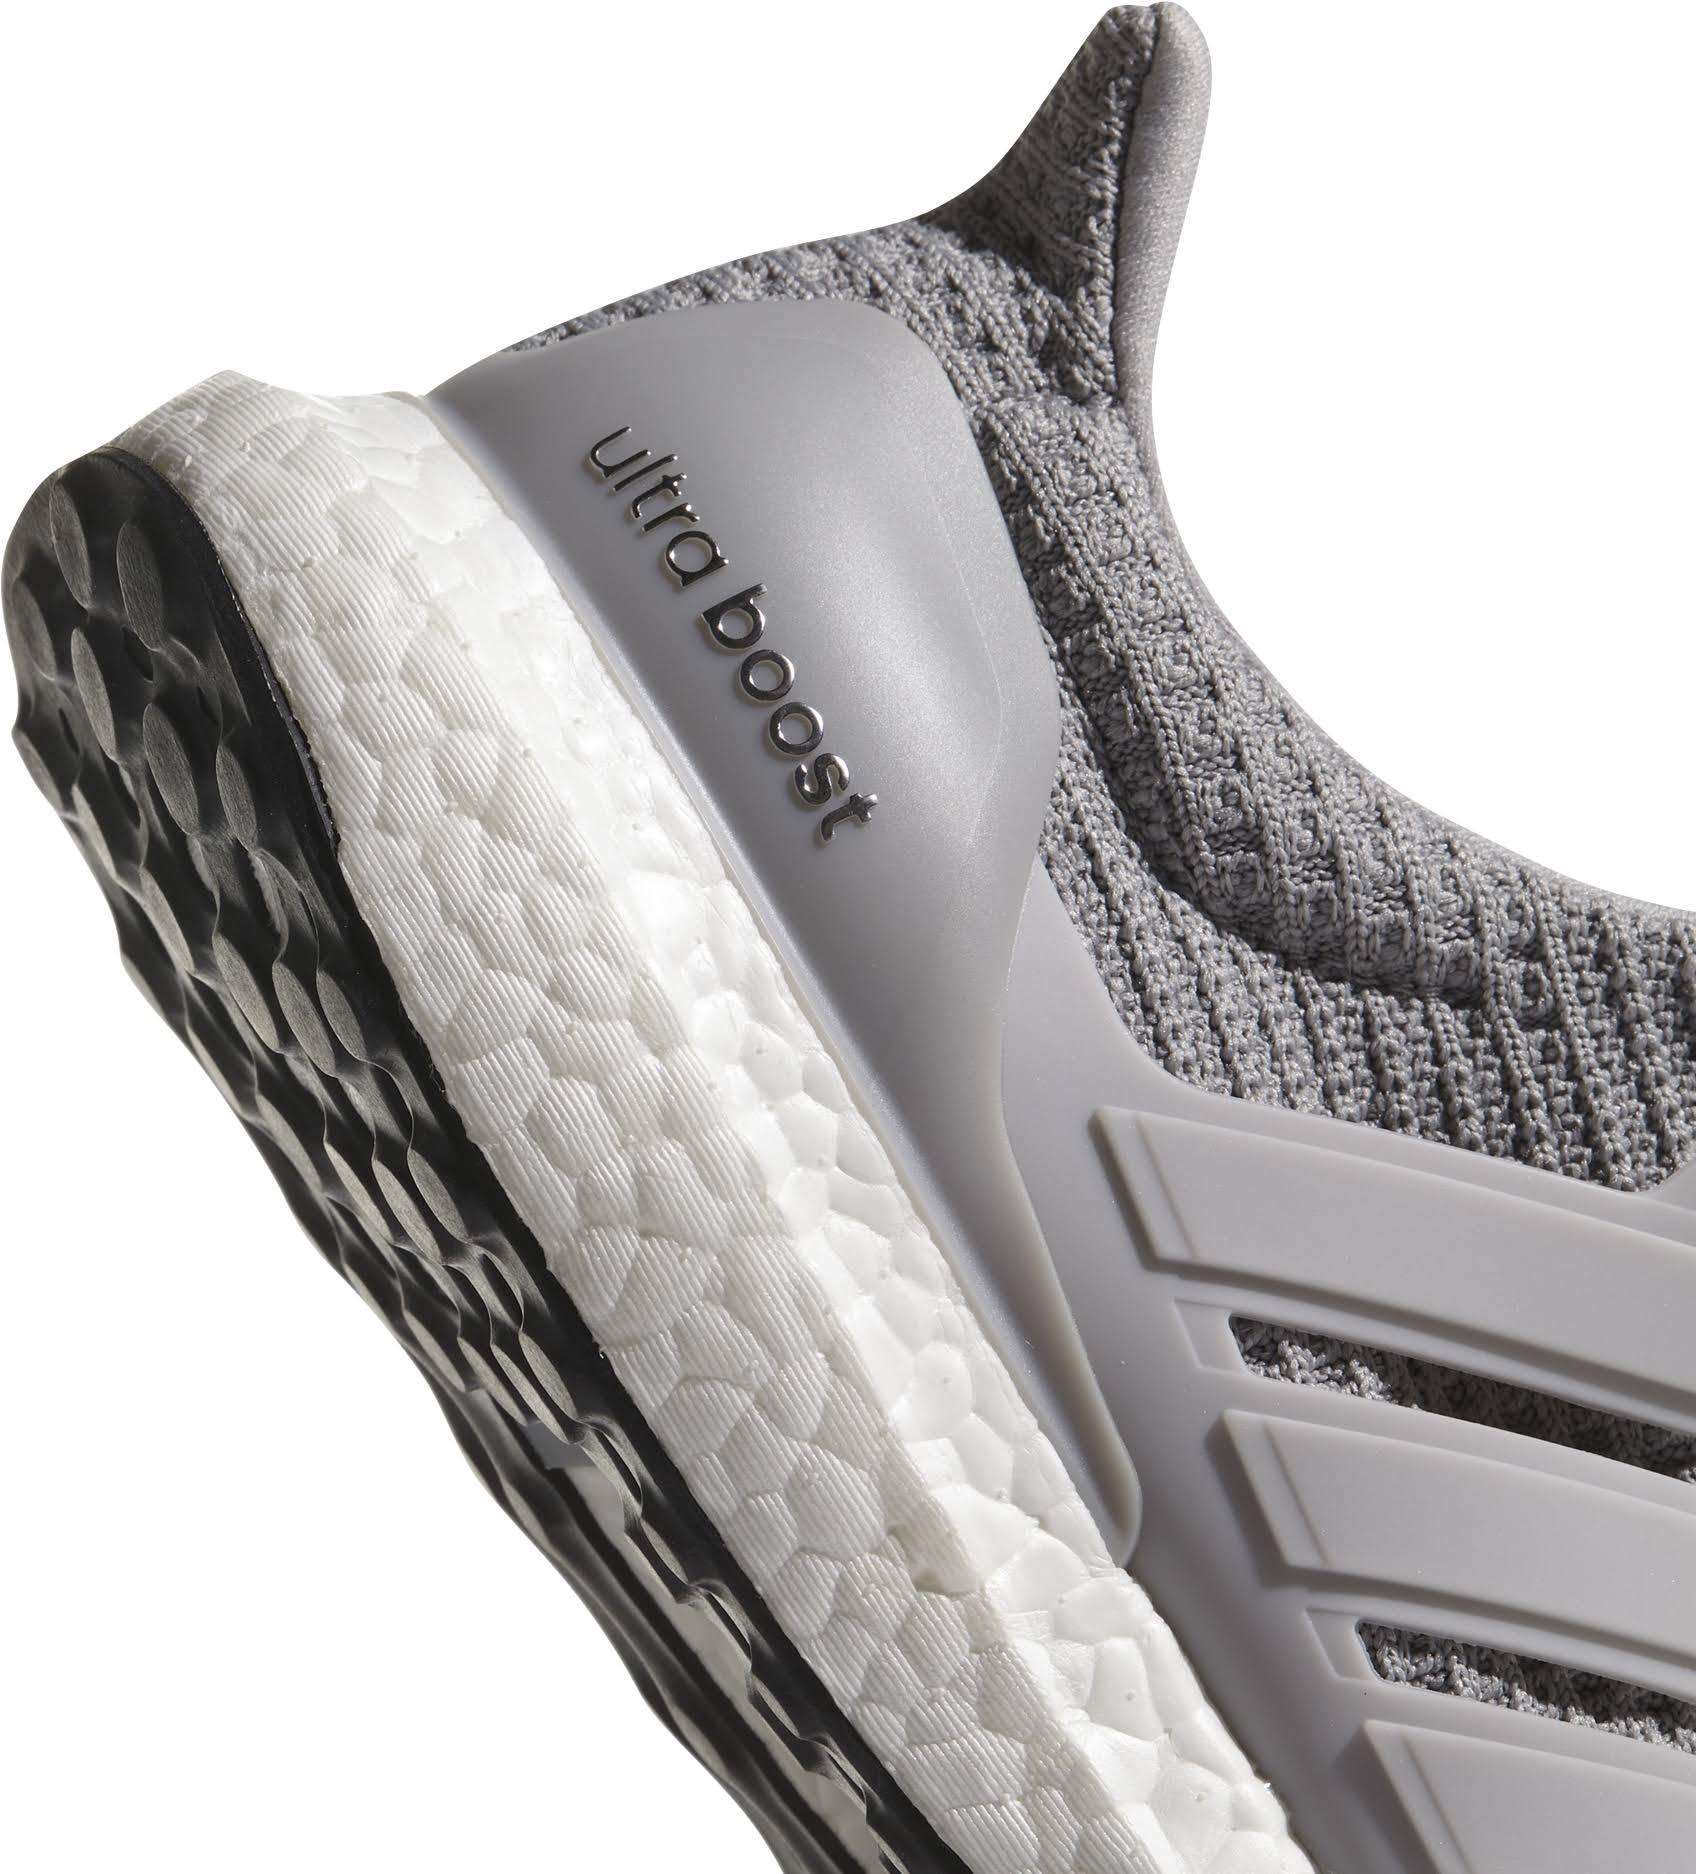 Adidas UltraboostGrigio UltraboostGrigio Adidas UltraboostGrigio Adidas UltraboostGrigio UltraboostGrigio Adidas Adidas 80wOXNnPk